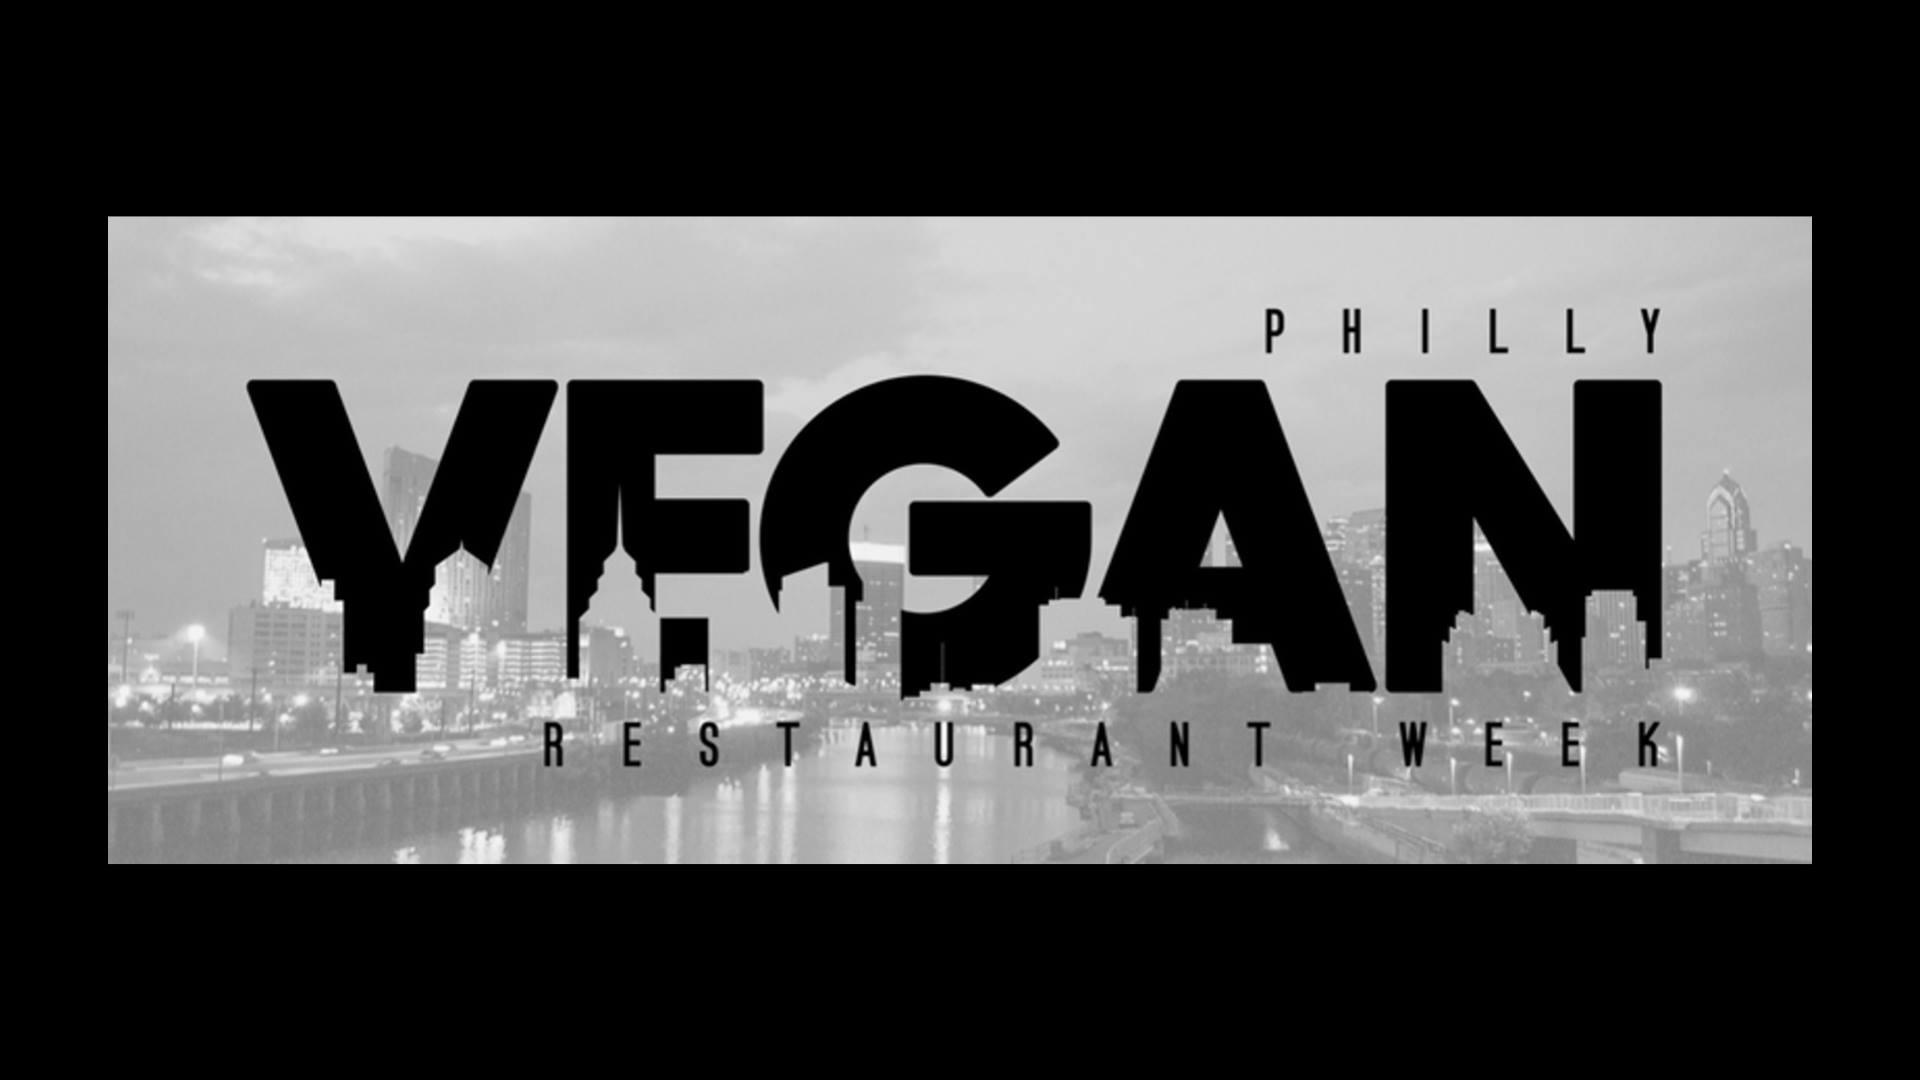 Philly Vegan Restaurant Week 2019 - FALL Edition